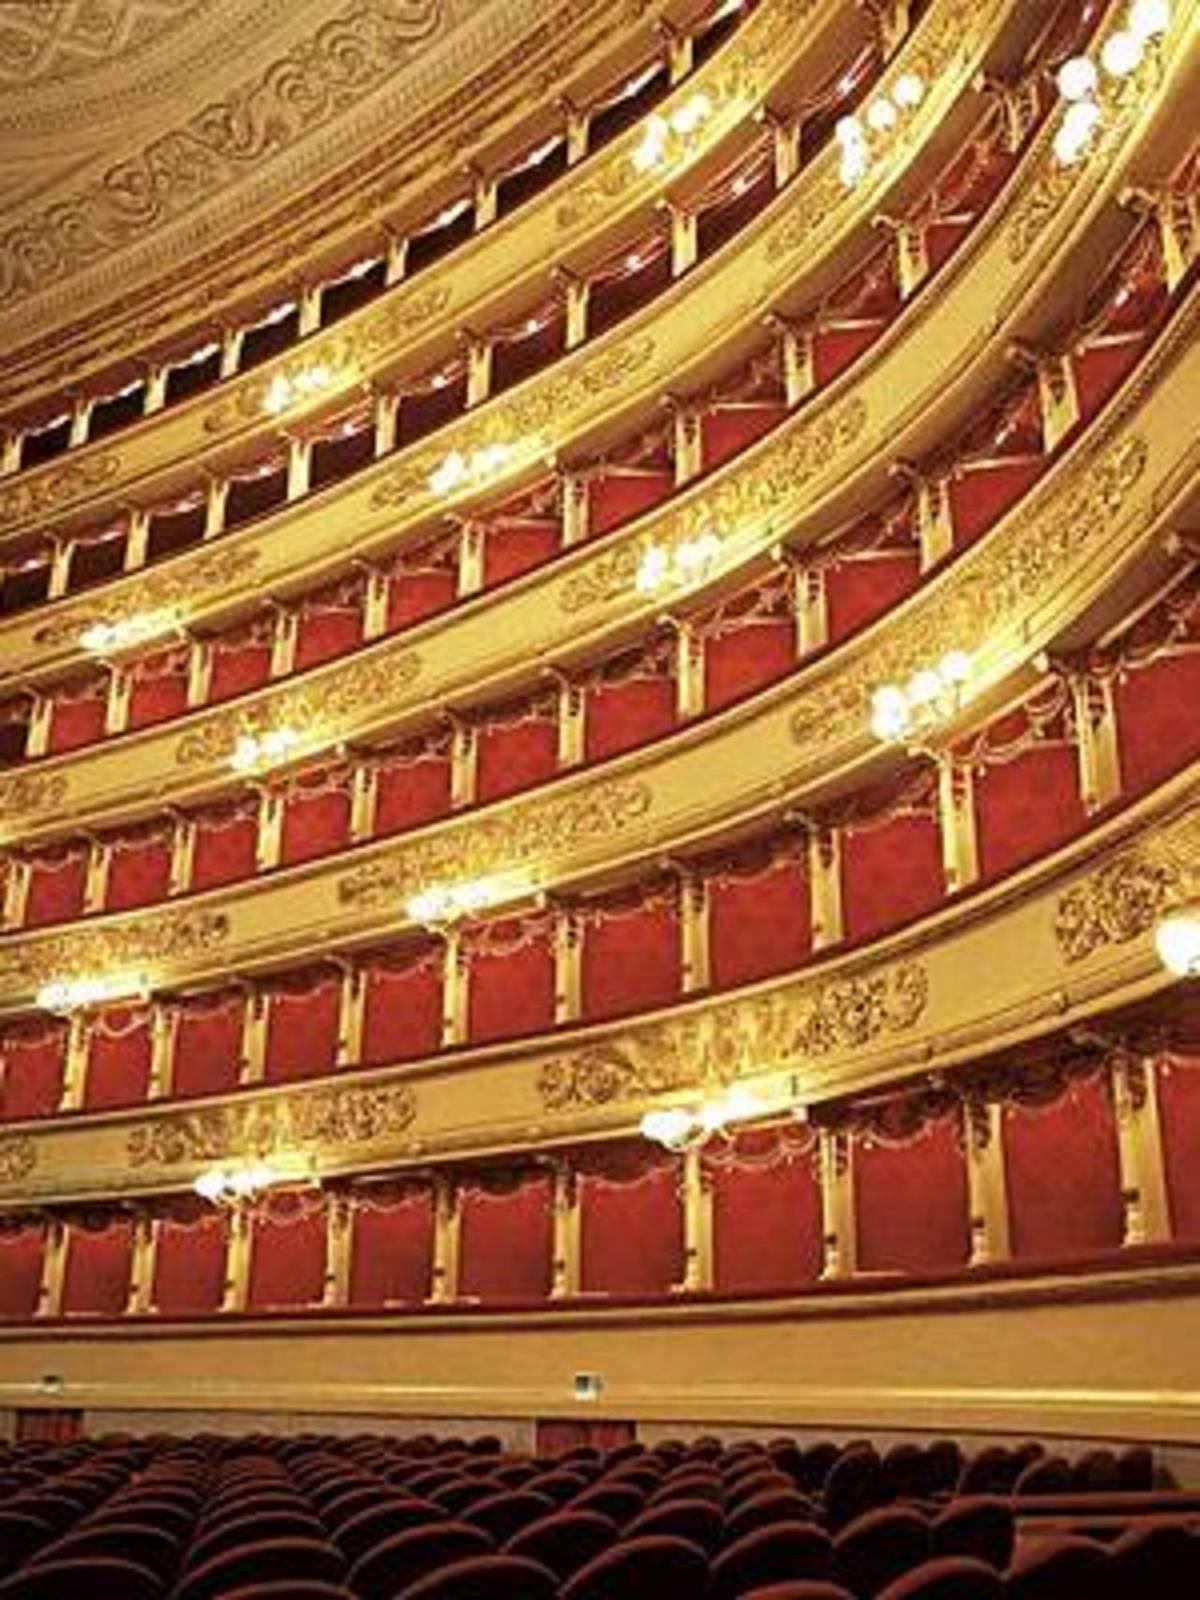 Restoration And Renovation Of Teatro Alla Scala Floornature